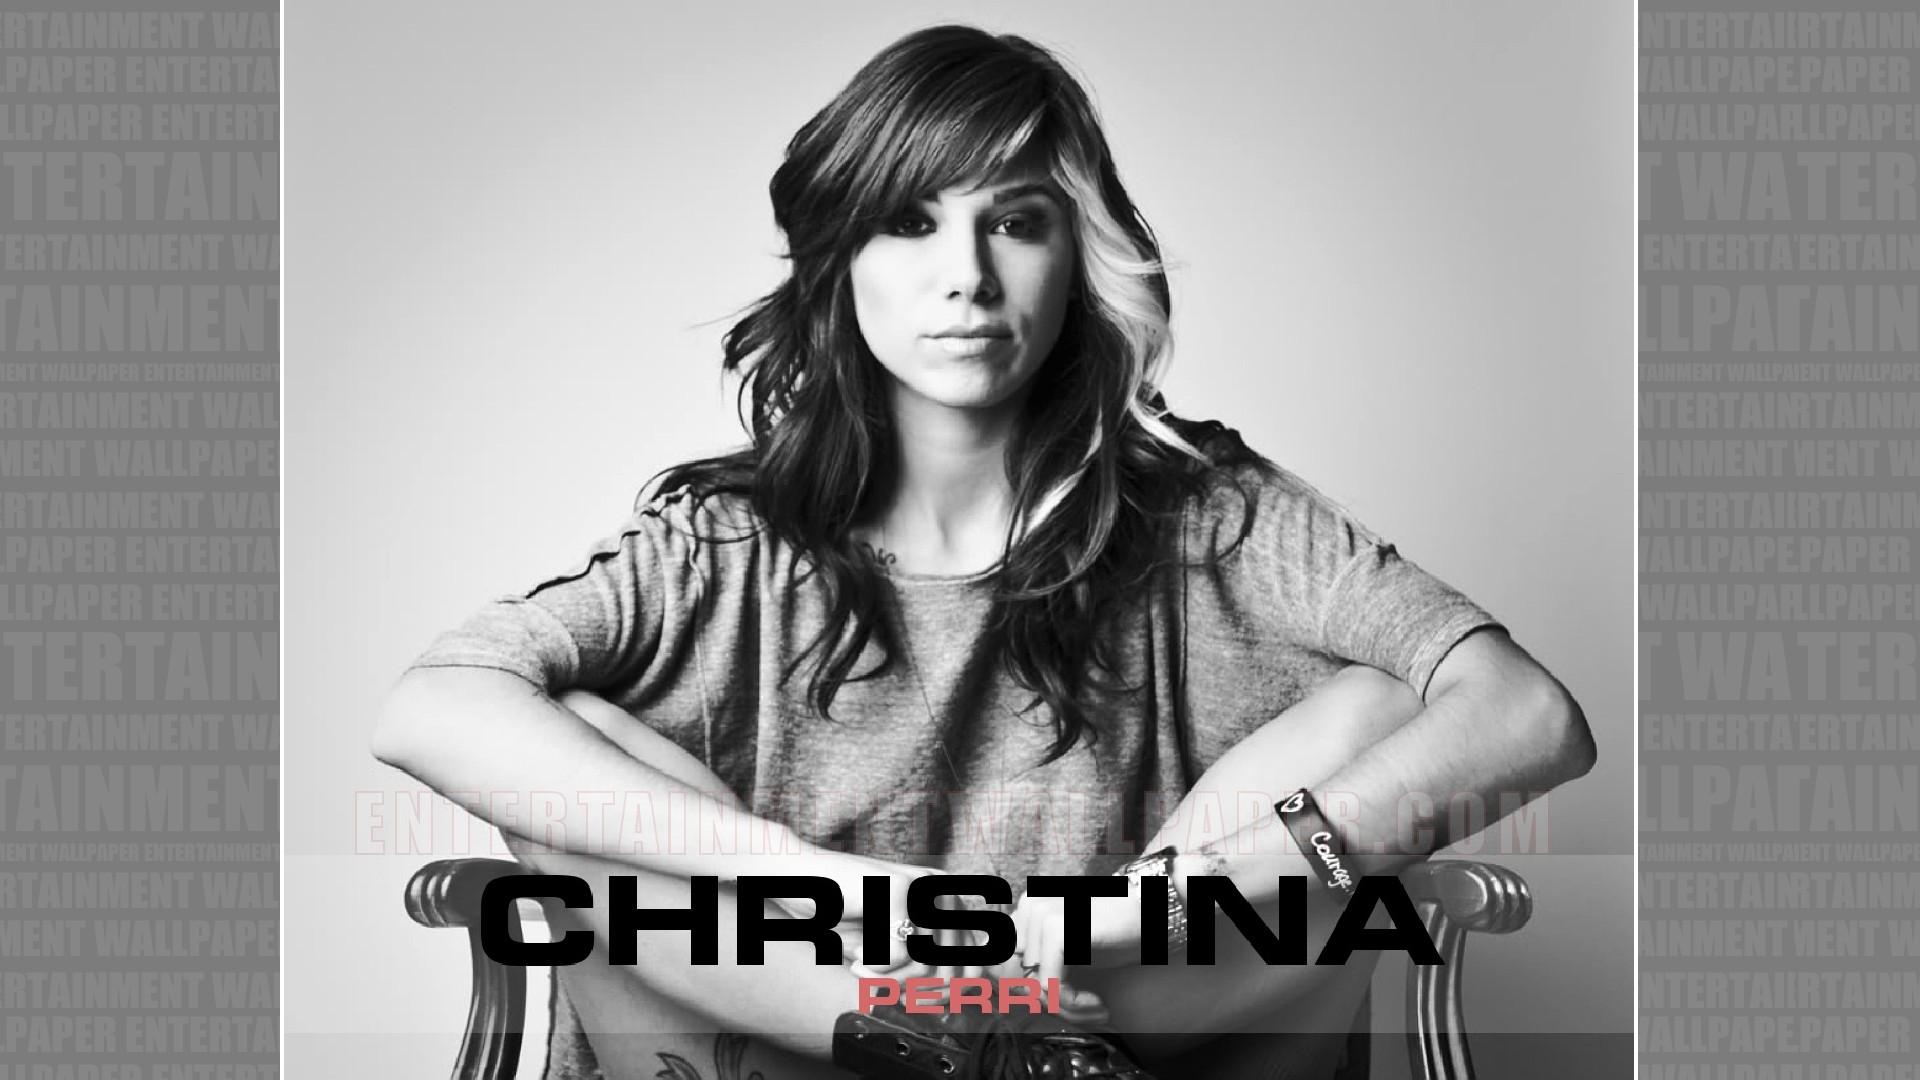 Christina Perri Wallpaper   40034246 1920x1080 1920x1080